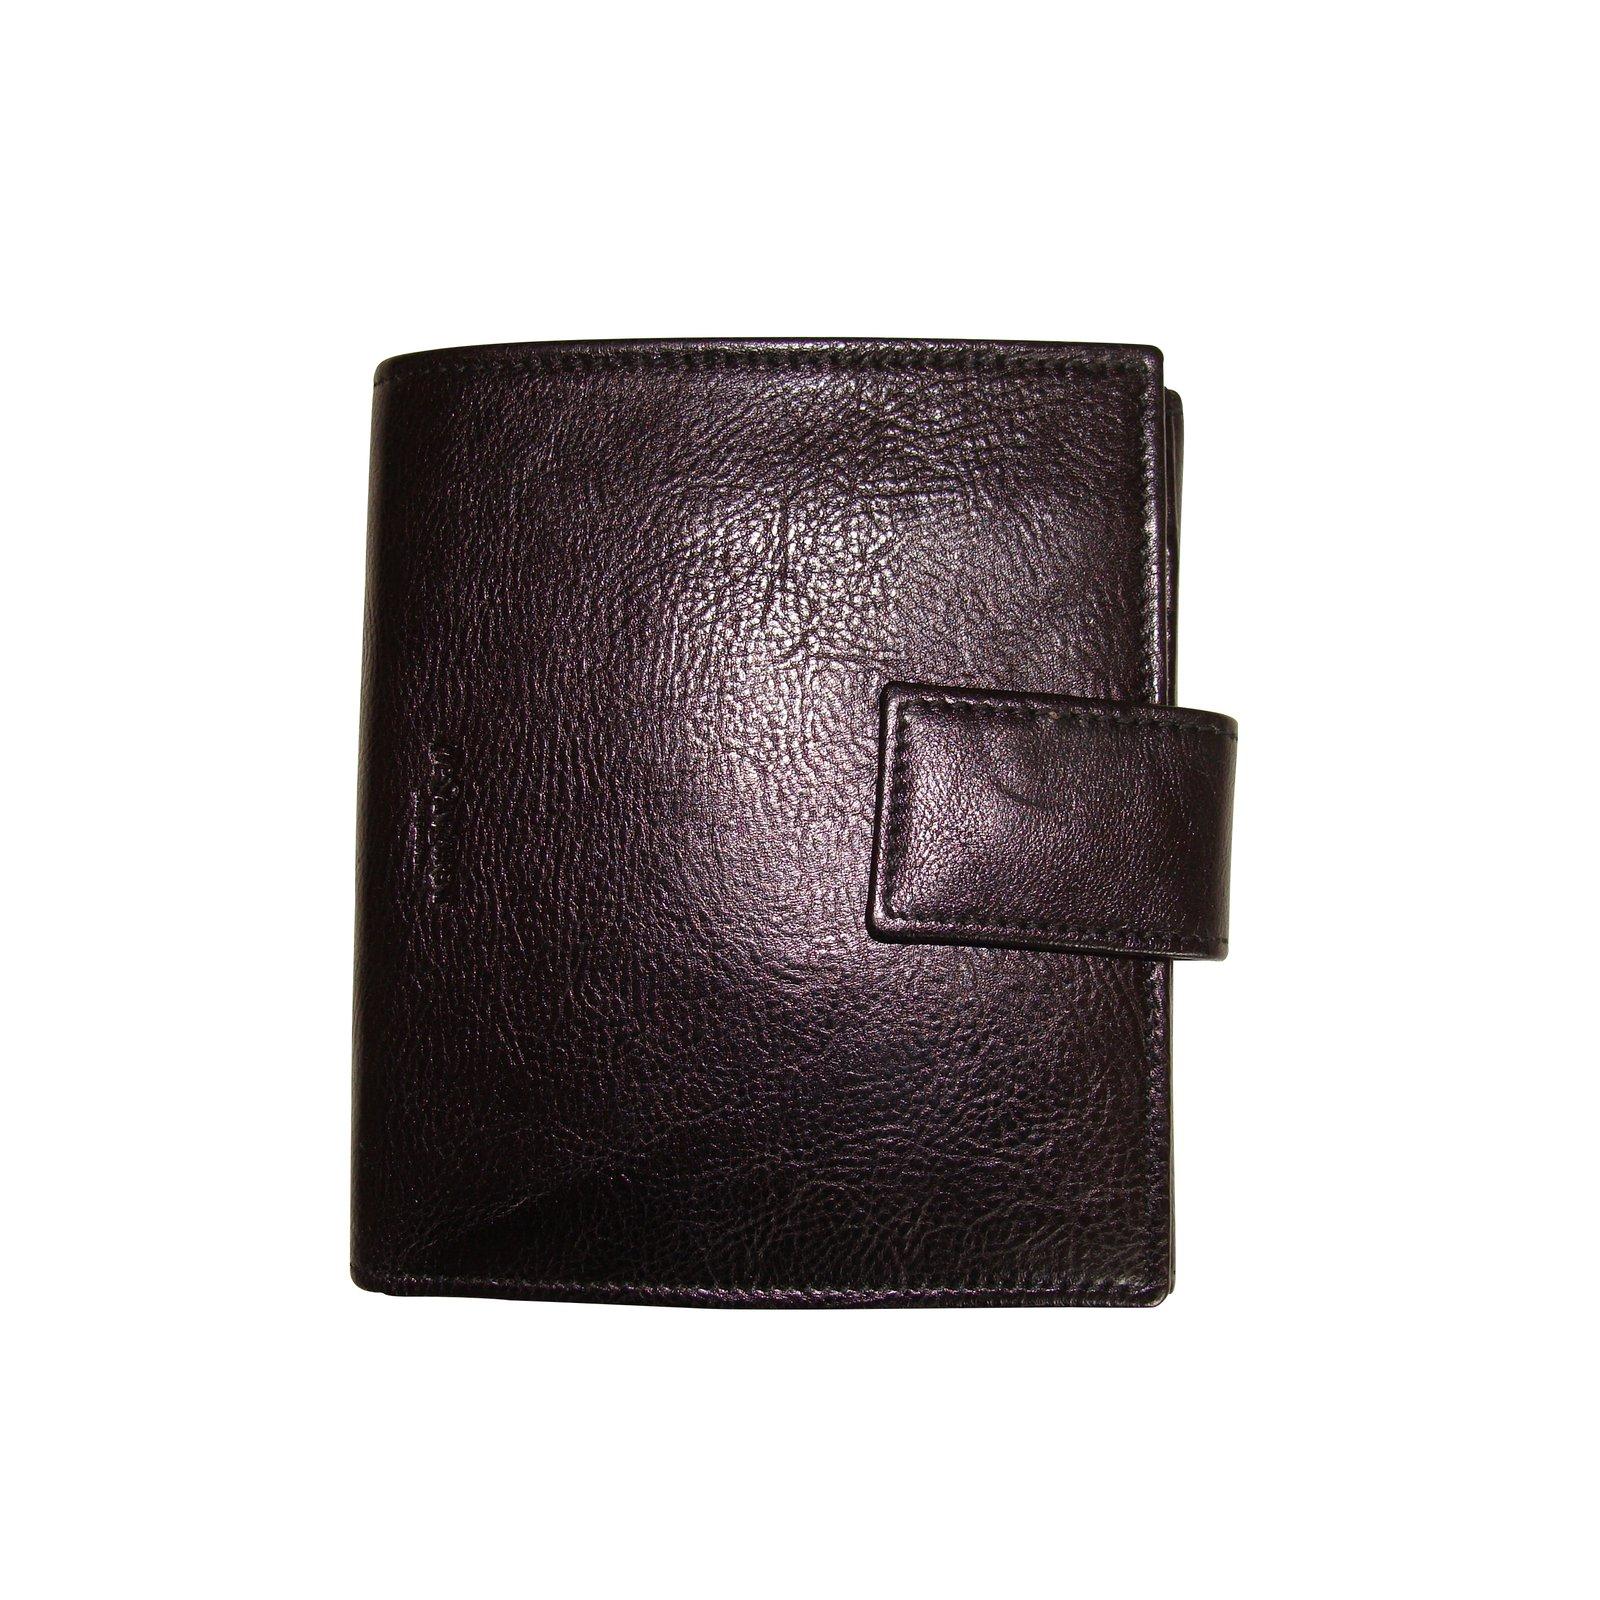 8b74ddacee7 Yves Saint Laurent Wallets Wallets Leather Black ref.99641 - Joli Closet